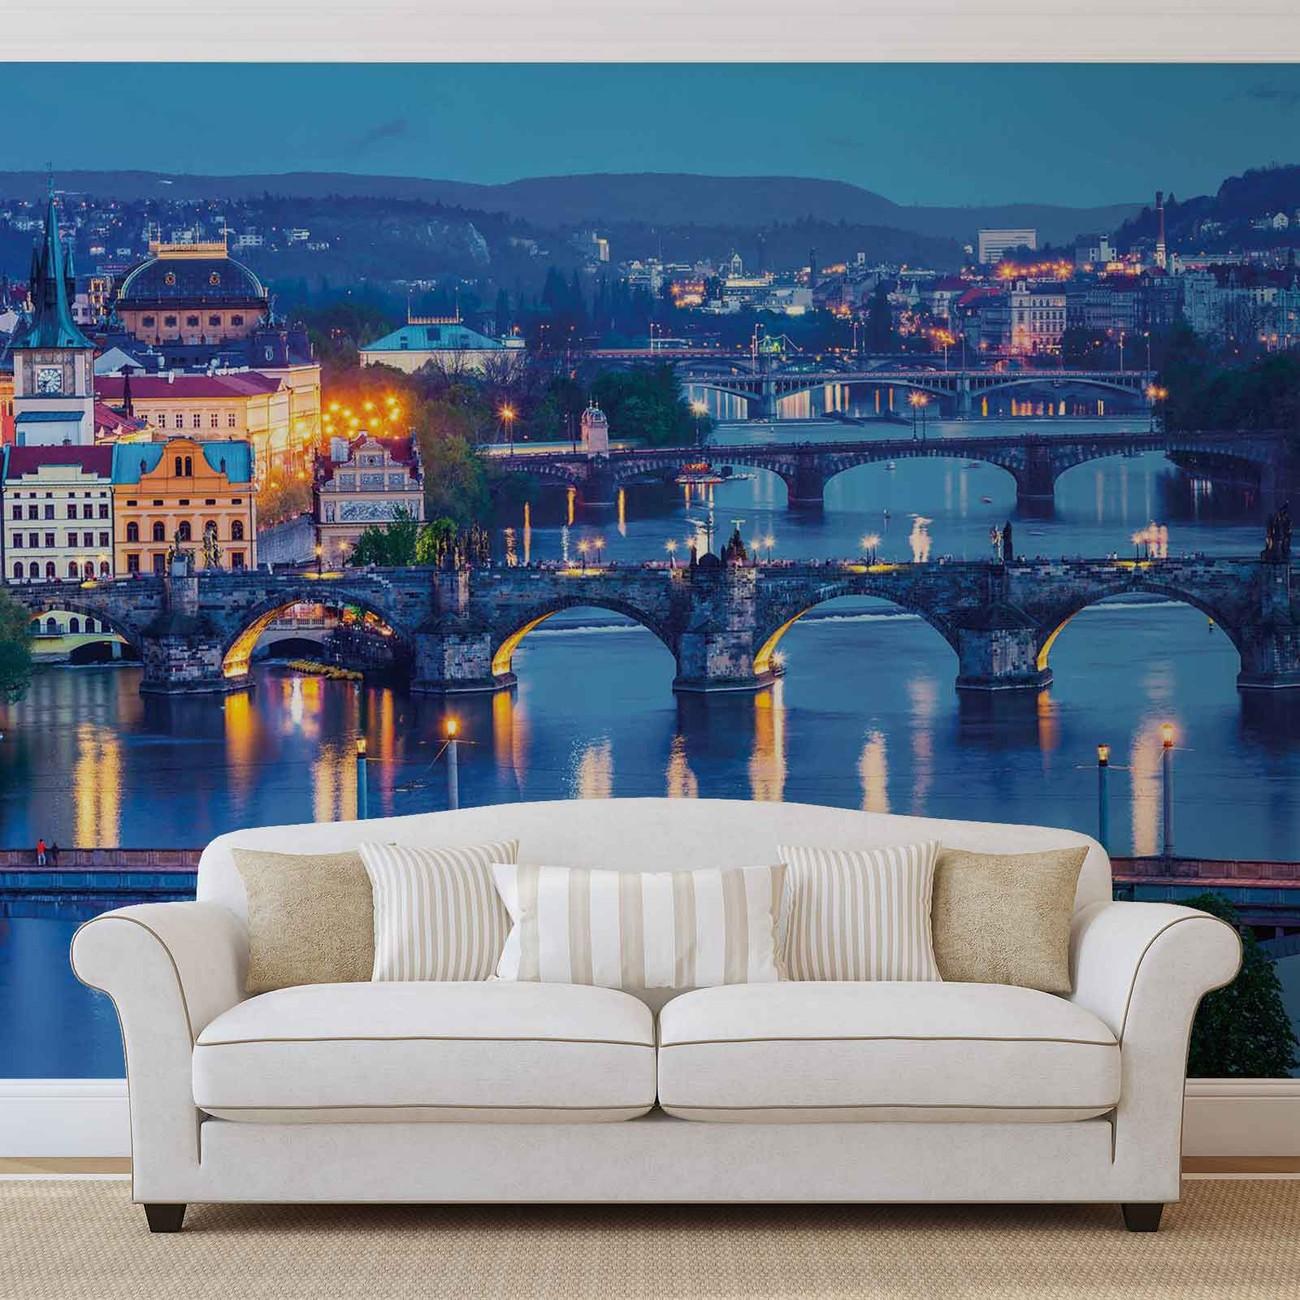 fototapete tapete stadt prag fluss br cke bei europosters kostenloser versand. Black Bedroom Furniture Sets. Home Design Ideas